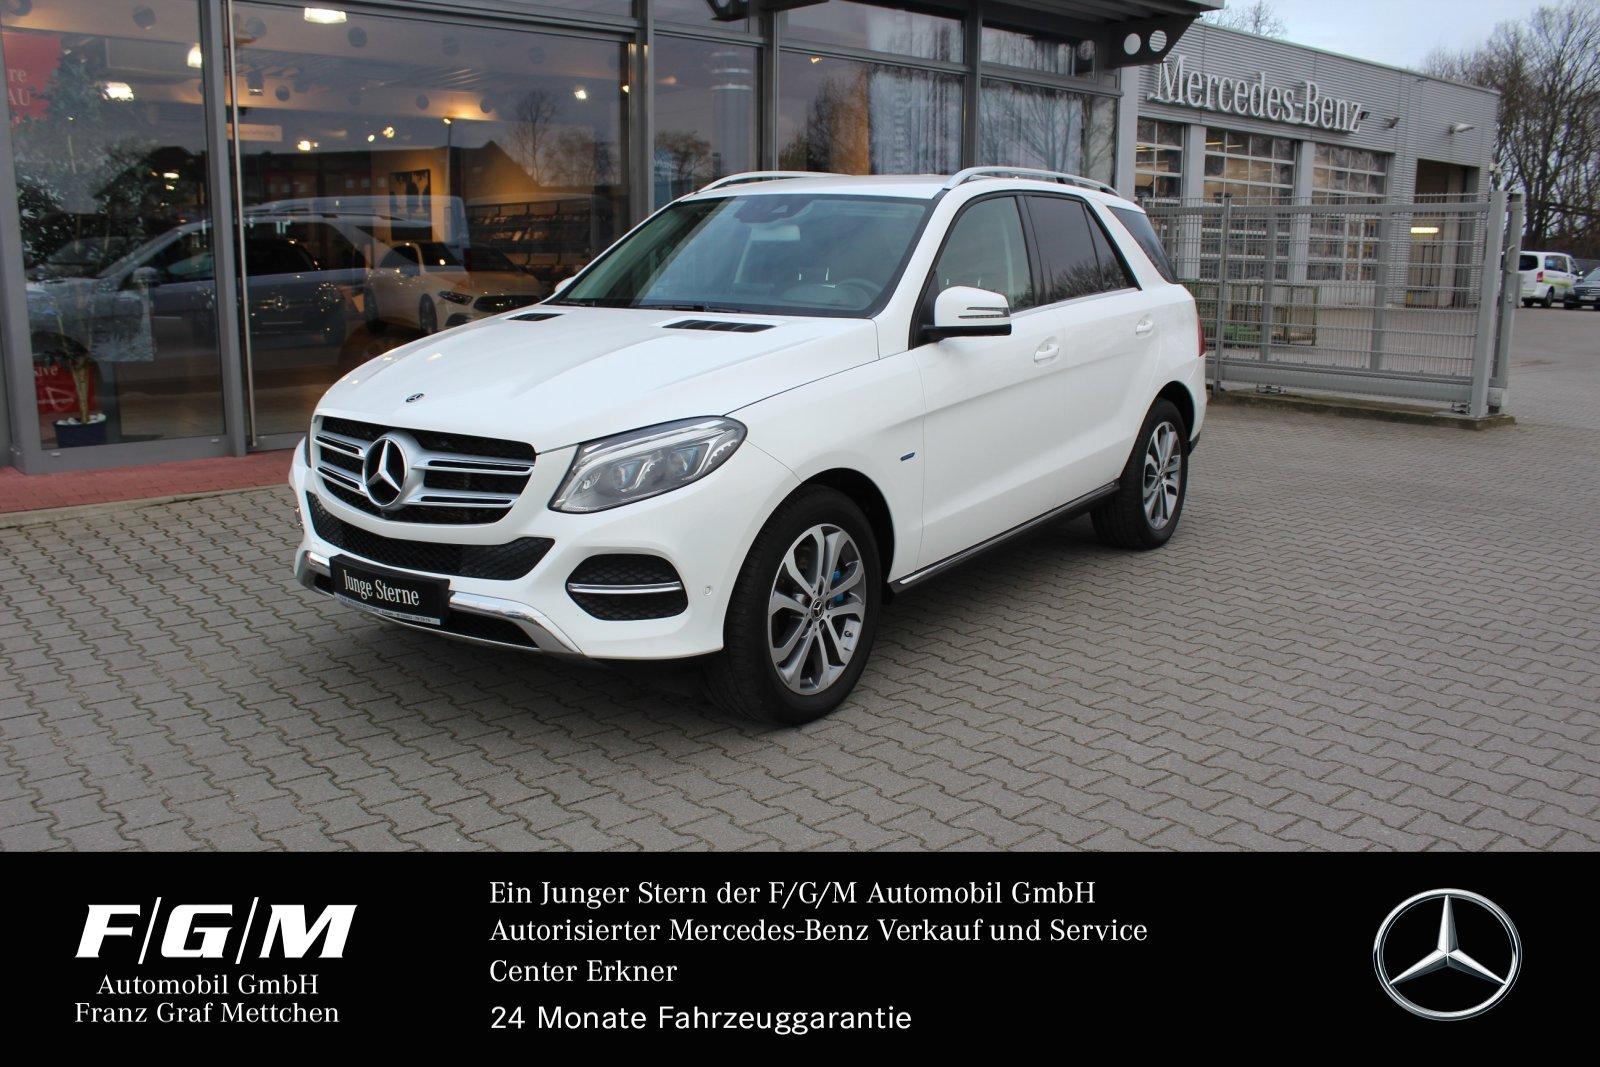 Mercedes-Benz GLE 500 e 4M Comand/ILS/360°/HUD/Airmatic/Memory, Jahr 2017, Hybrid